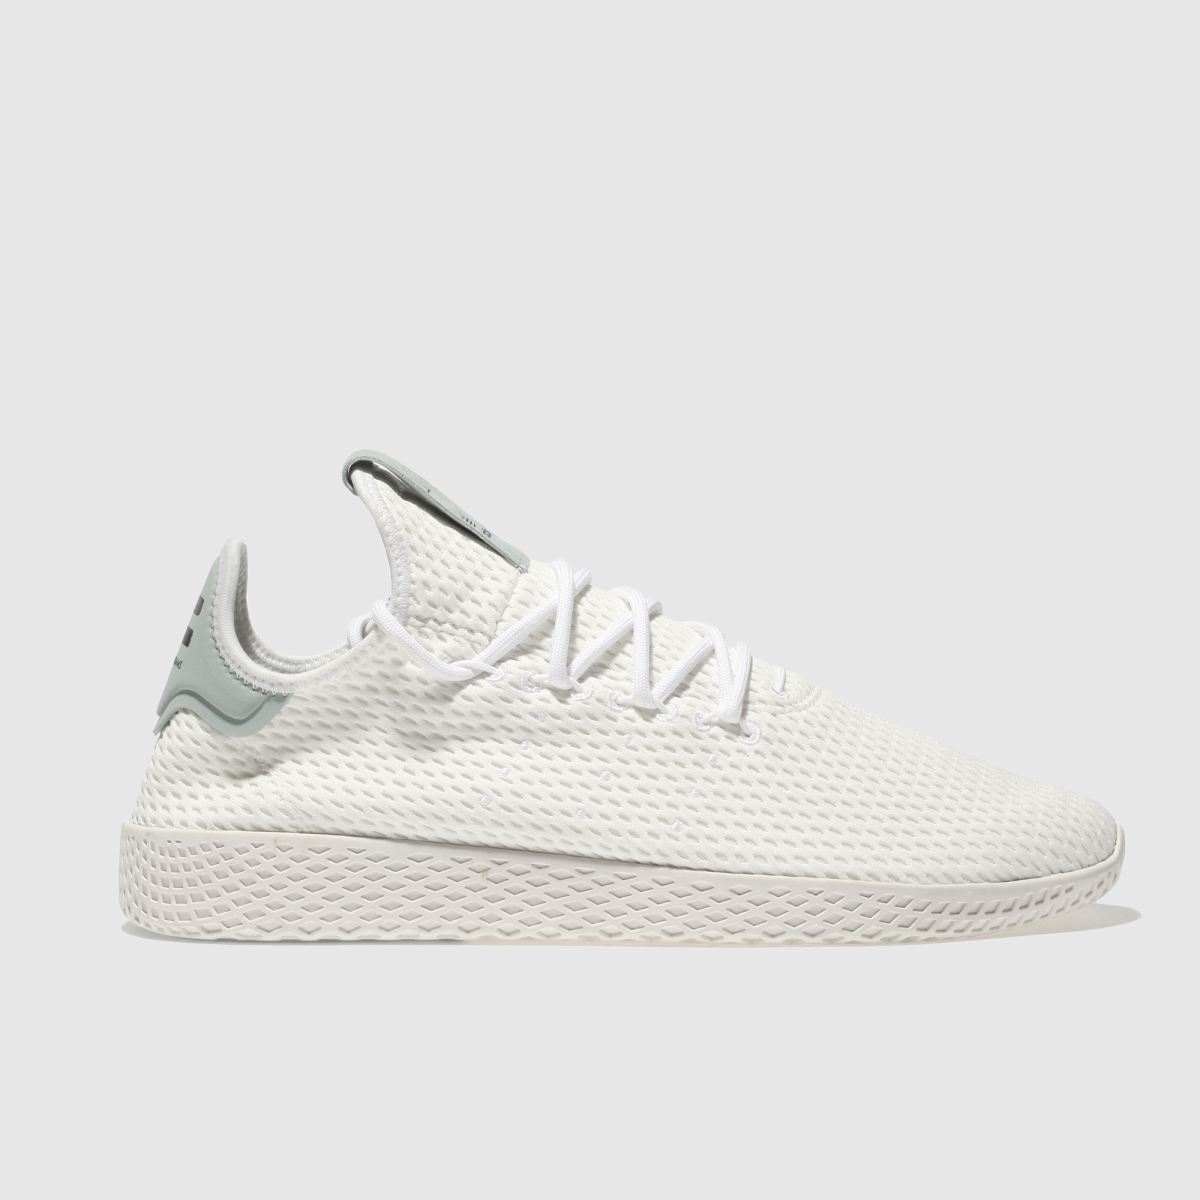 adidas white & green pharrell williams tennis hu trainers